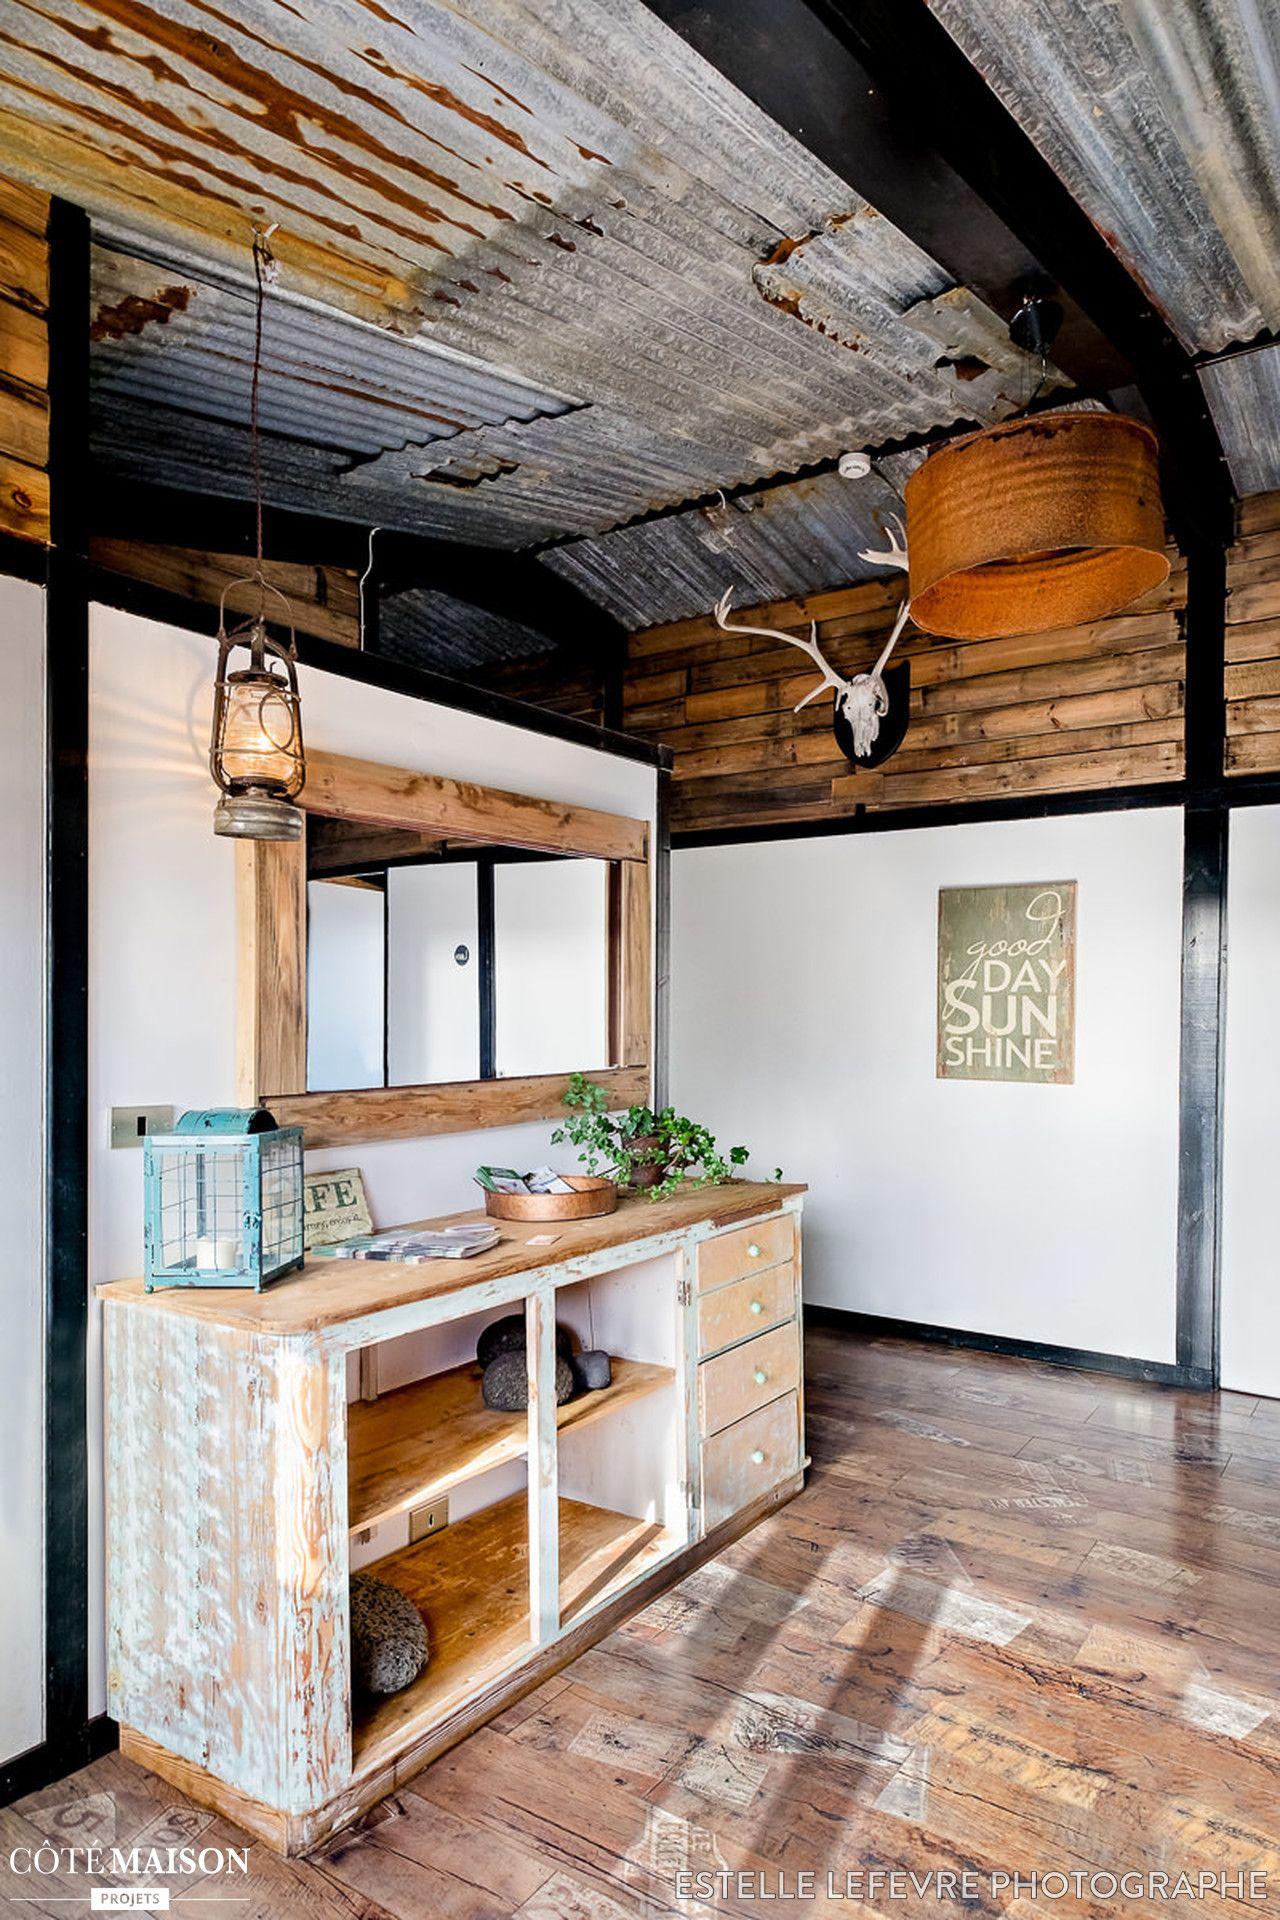 Plafond bardage t le ondul e rouill e home salle de bain en 2019 bardage tole tole ondulee - Maison en tole ondulee ...